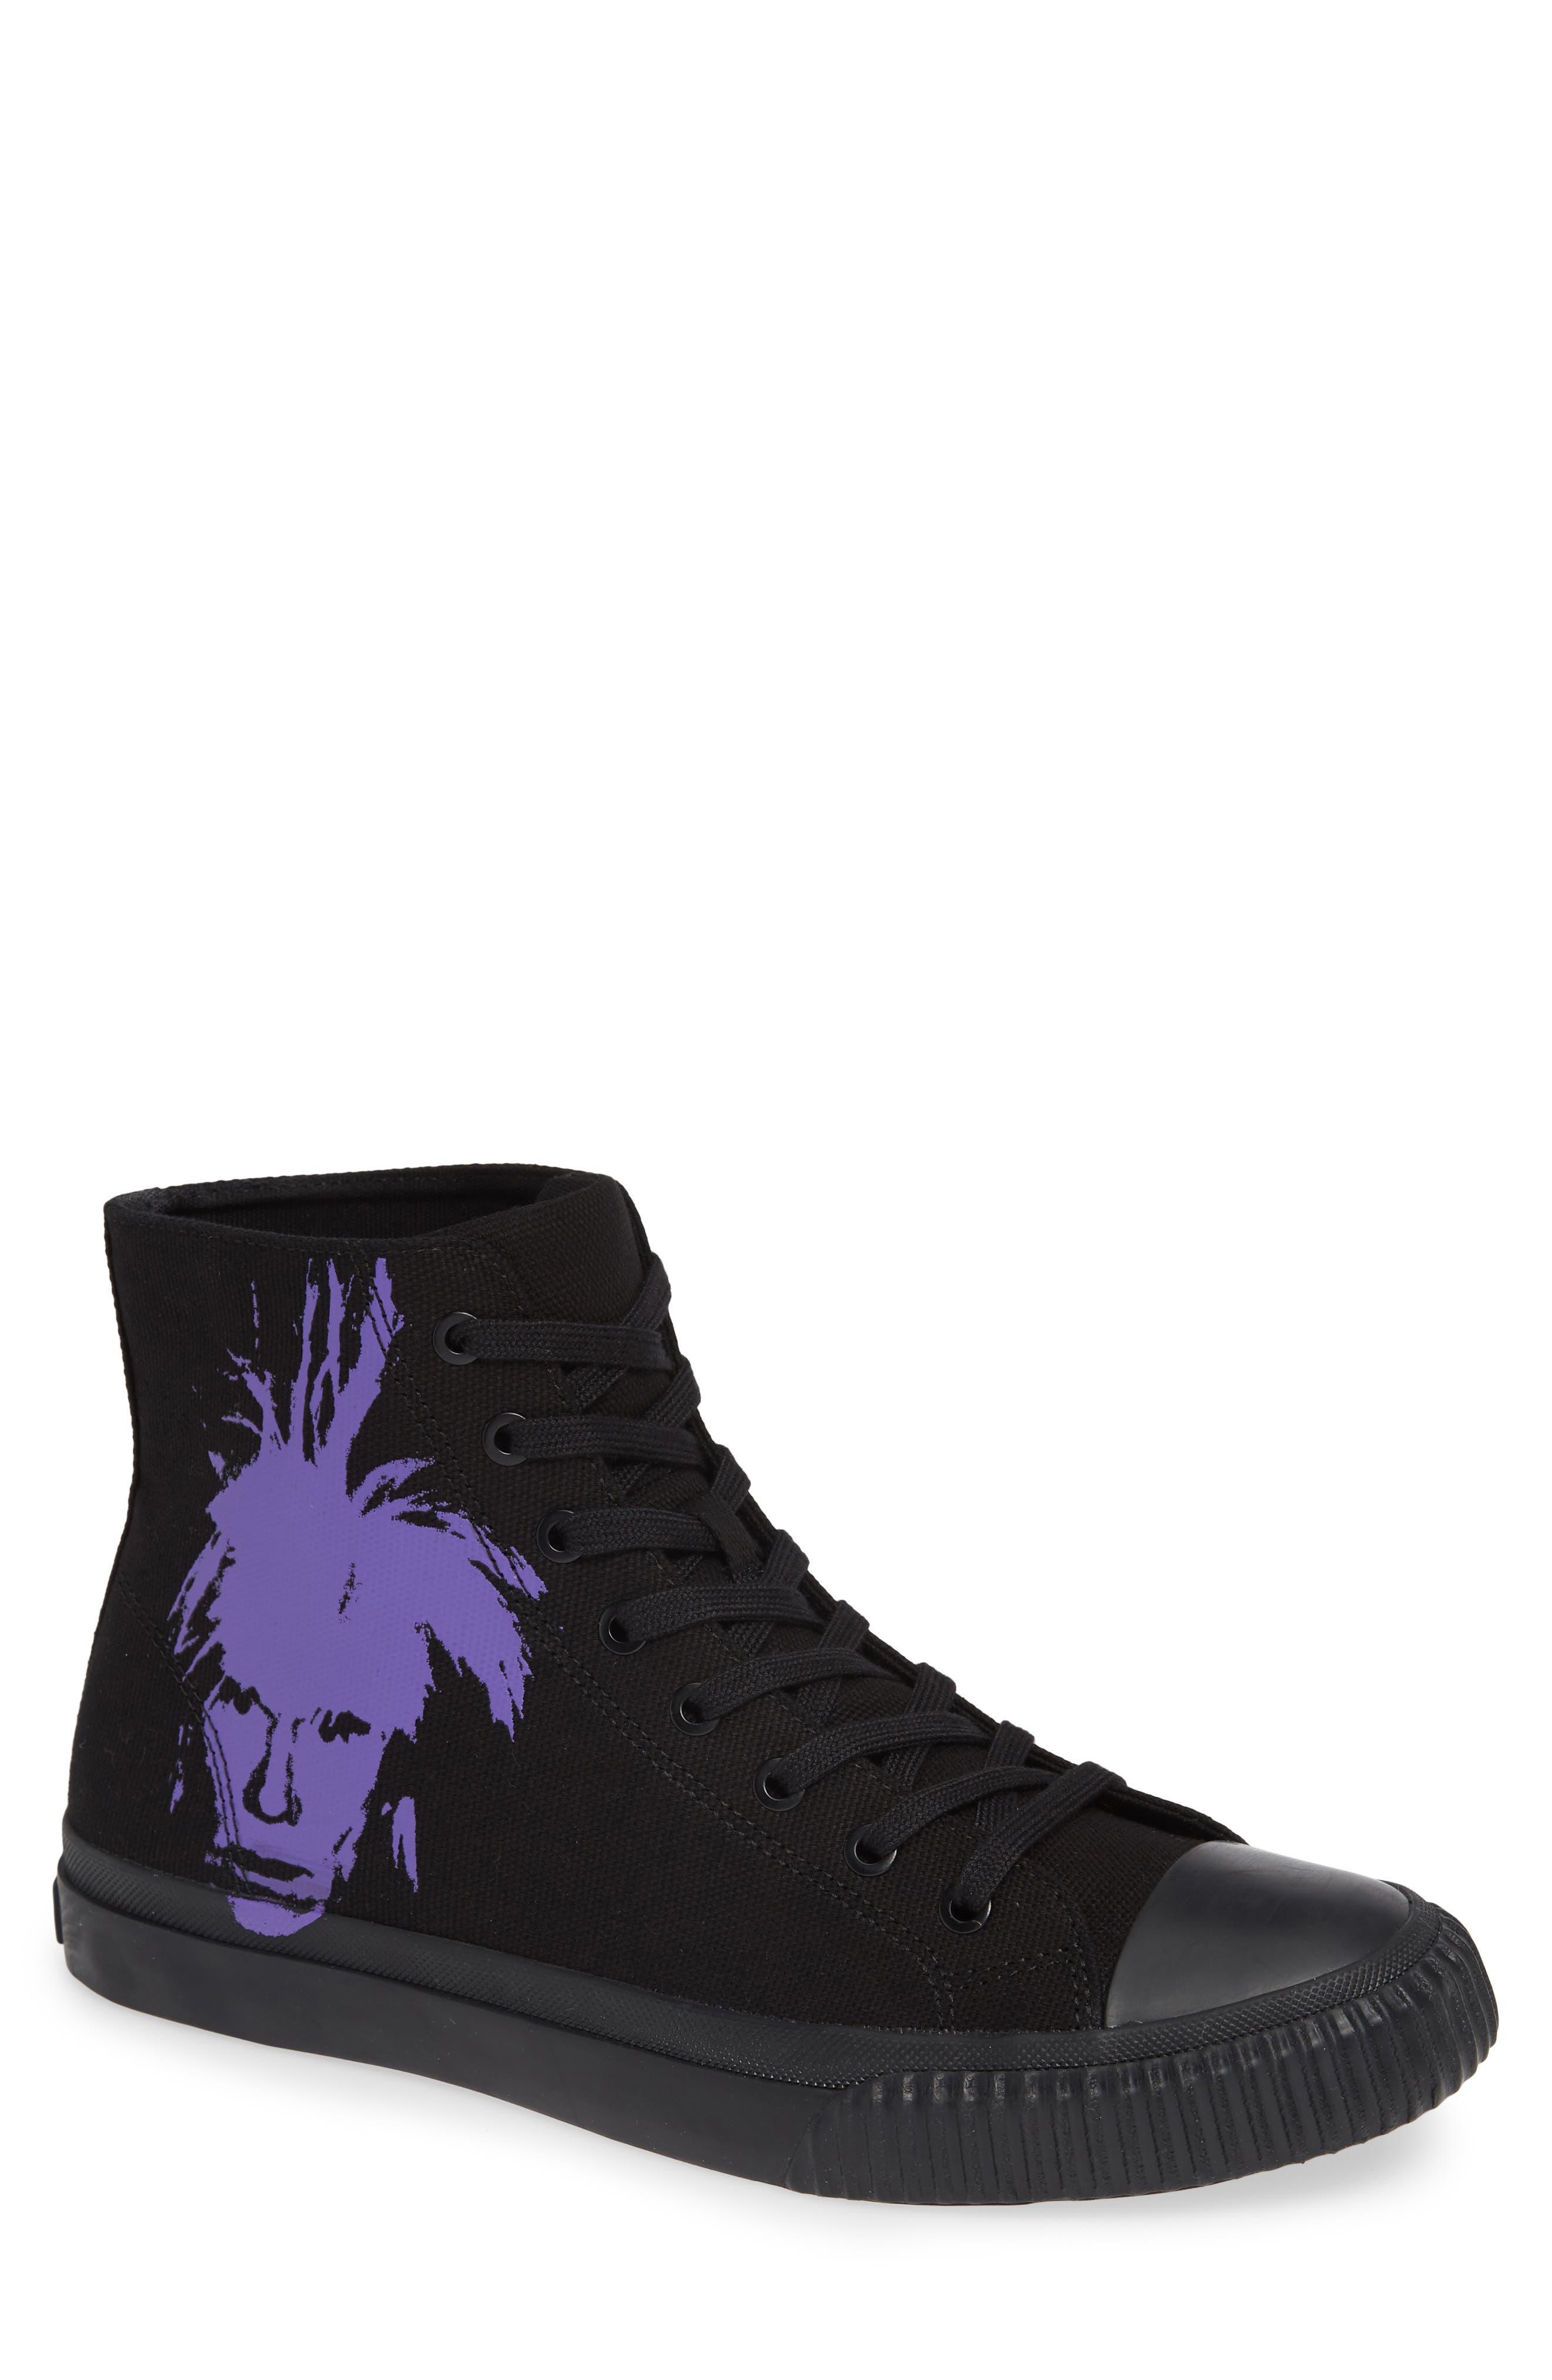 Iconic Warhol Sneaker,                             Main thumbnail 1, color,                             006